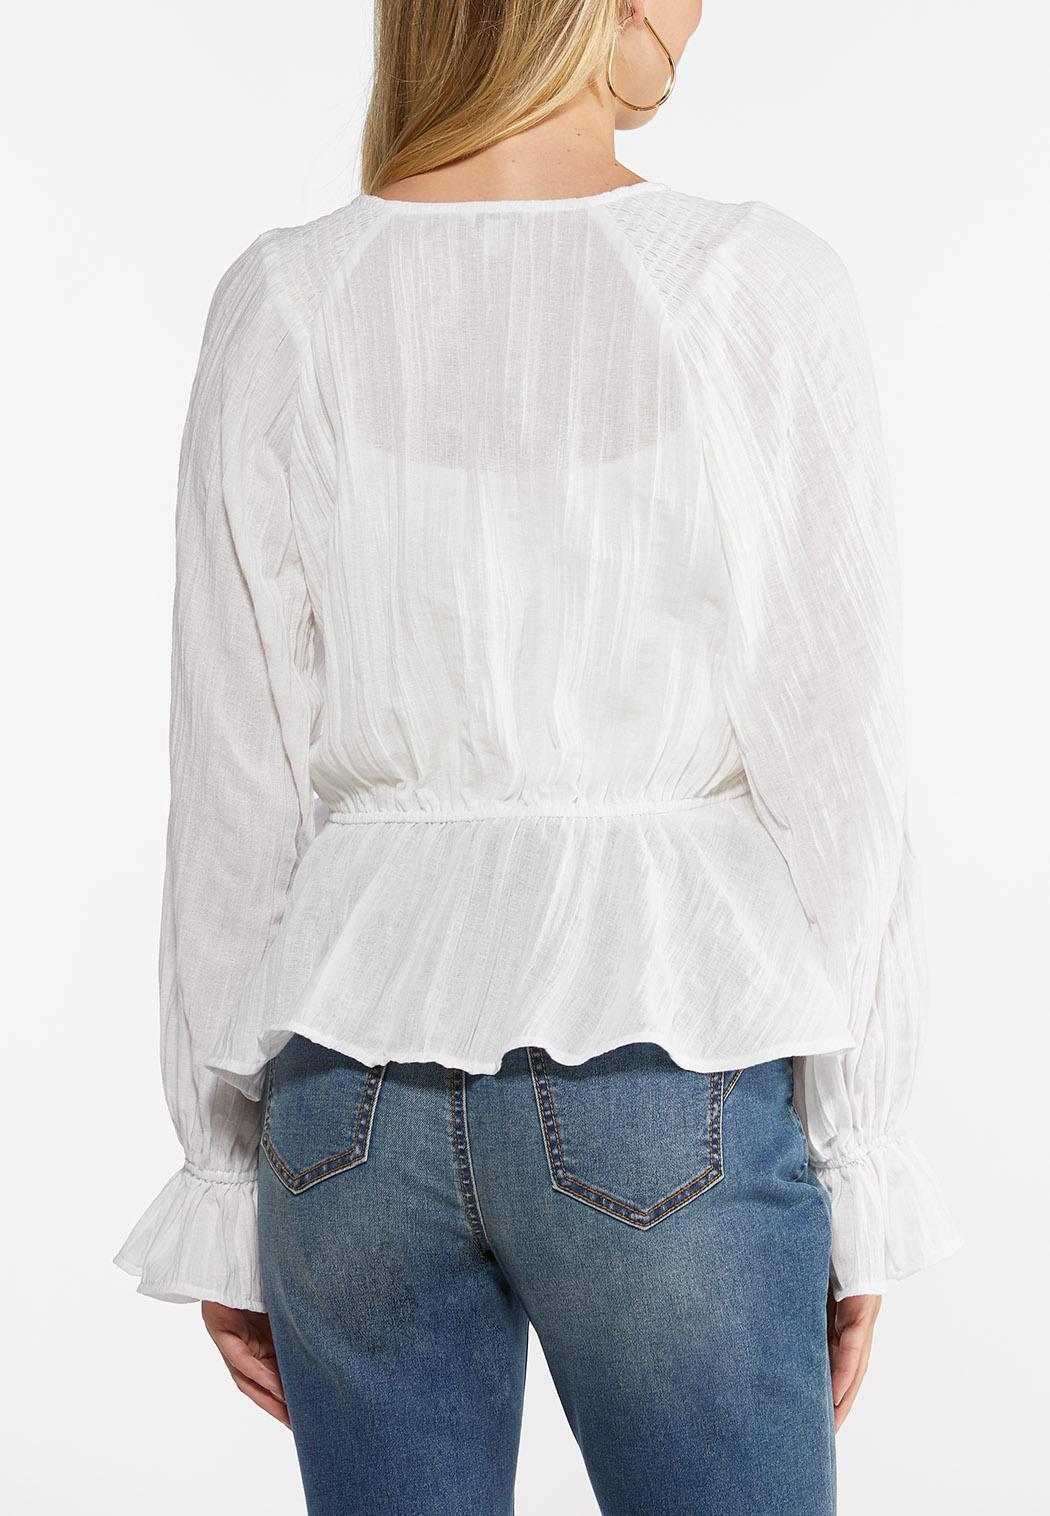 Crinkled Balloon Sleeve Top (Item #44465315)